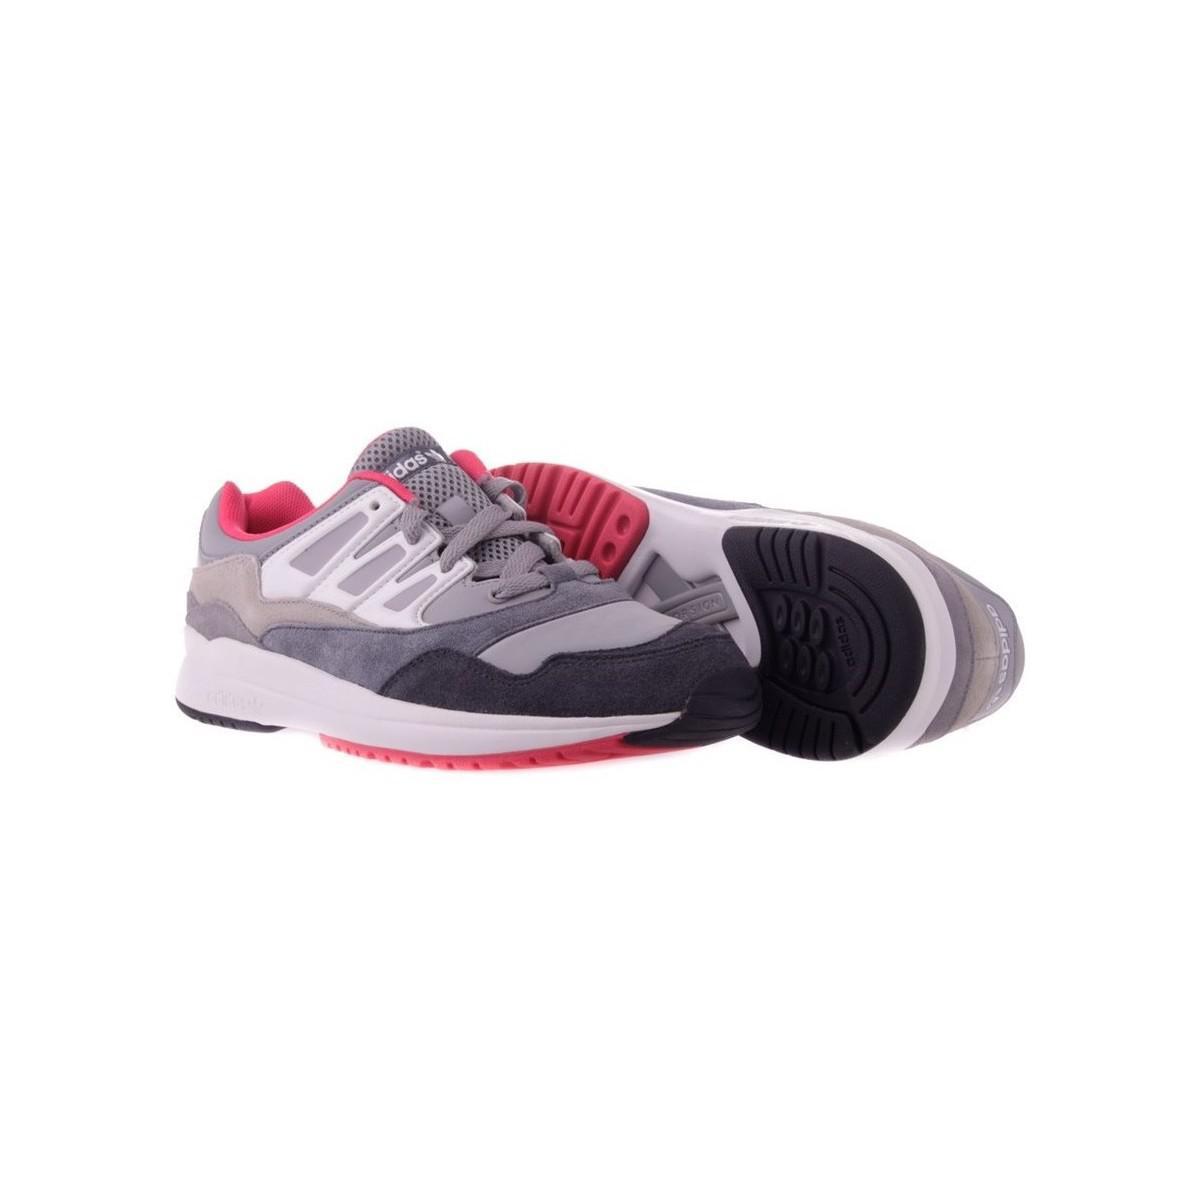 adidas Originals Torsion Allegra W Women s Shoes (trainers) In Pink ... bebc30ab5d45